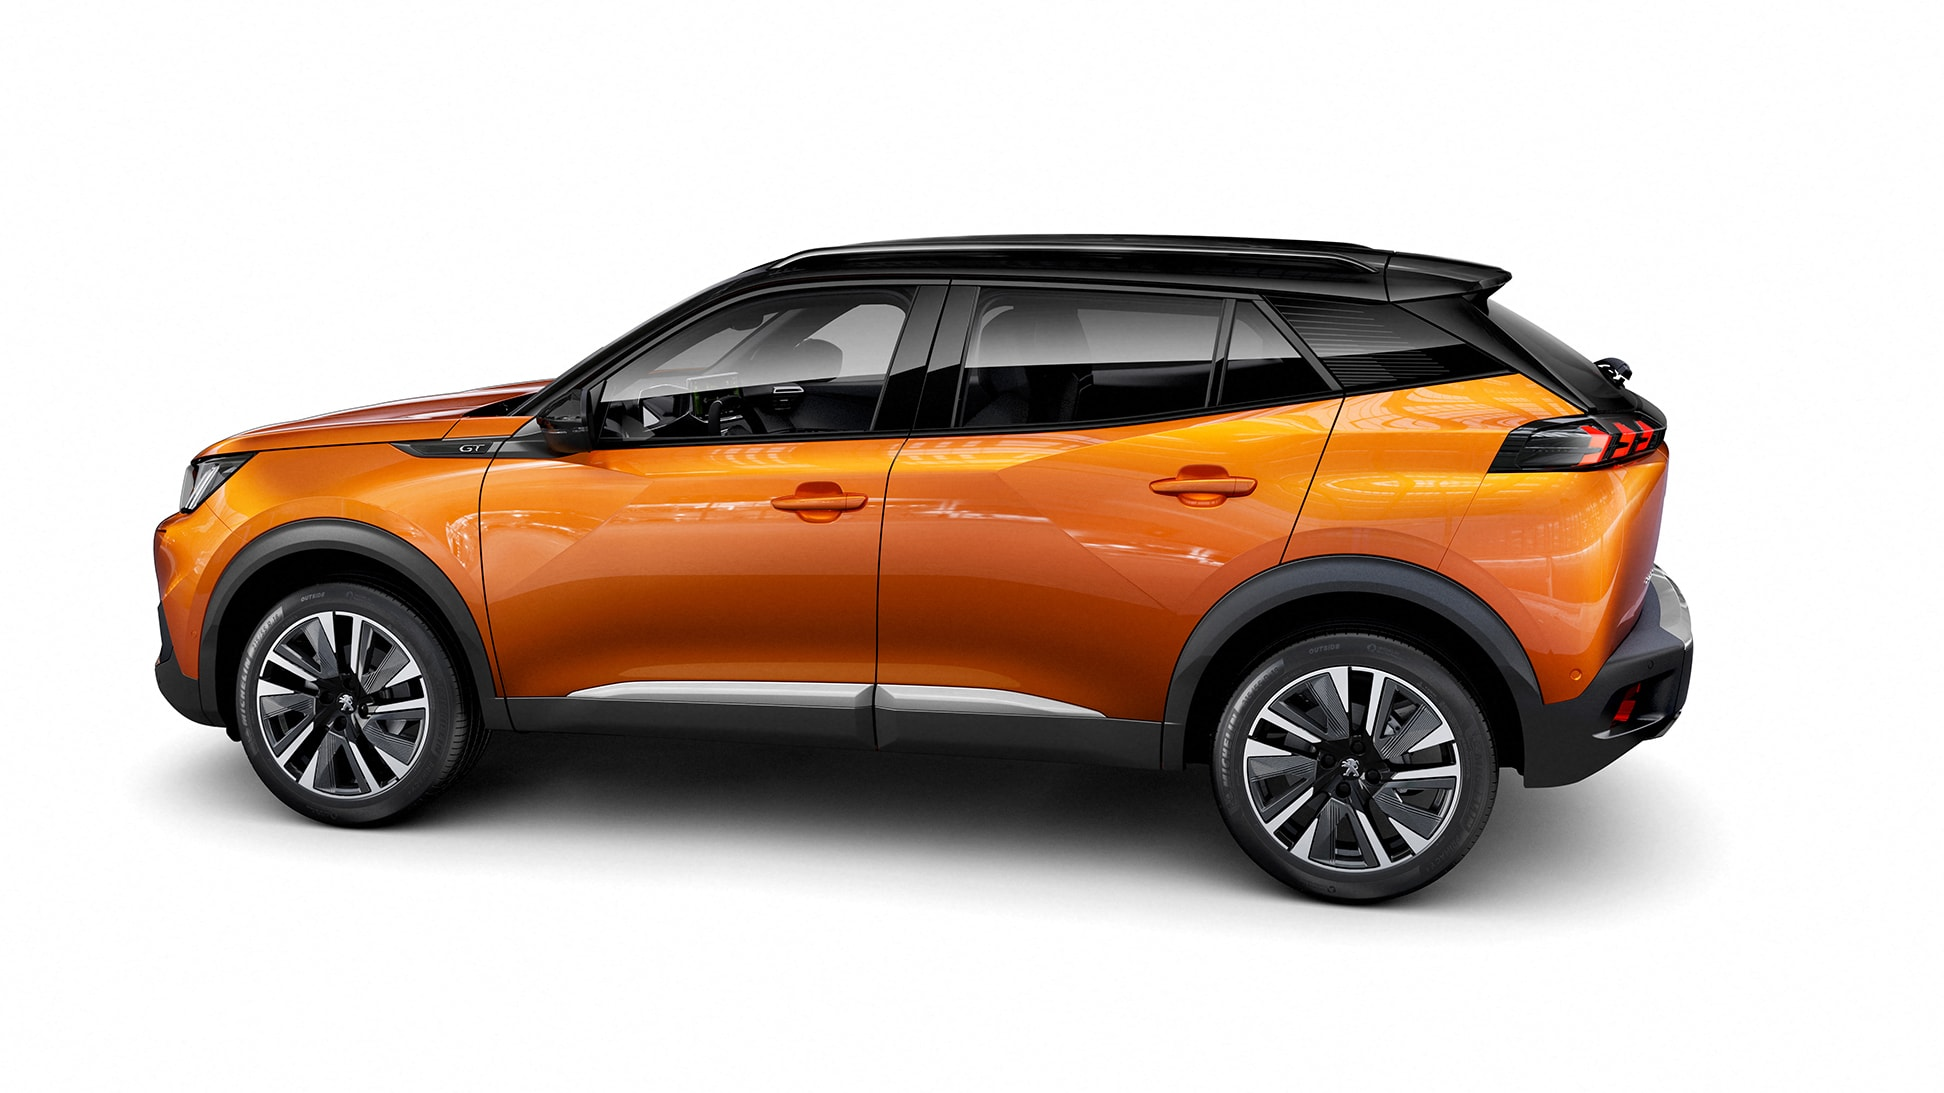 2021 Peugeot 2008 revealed - UPDATE: Australia confirmed ...